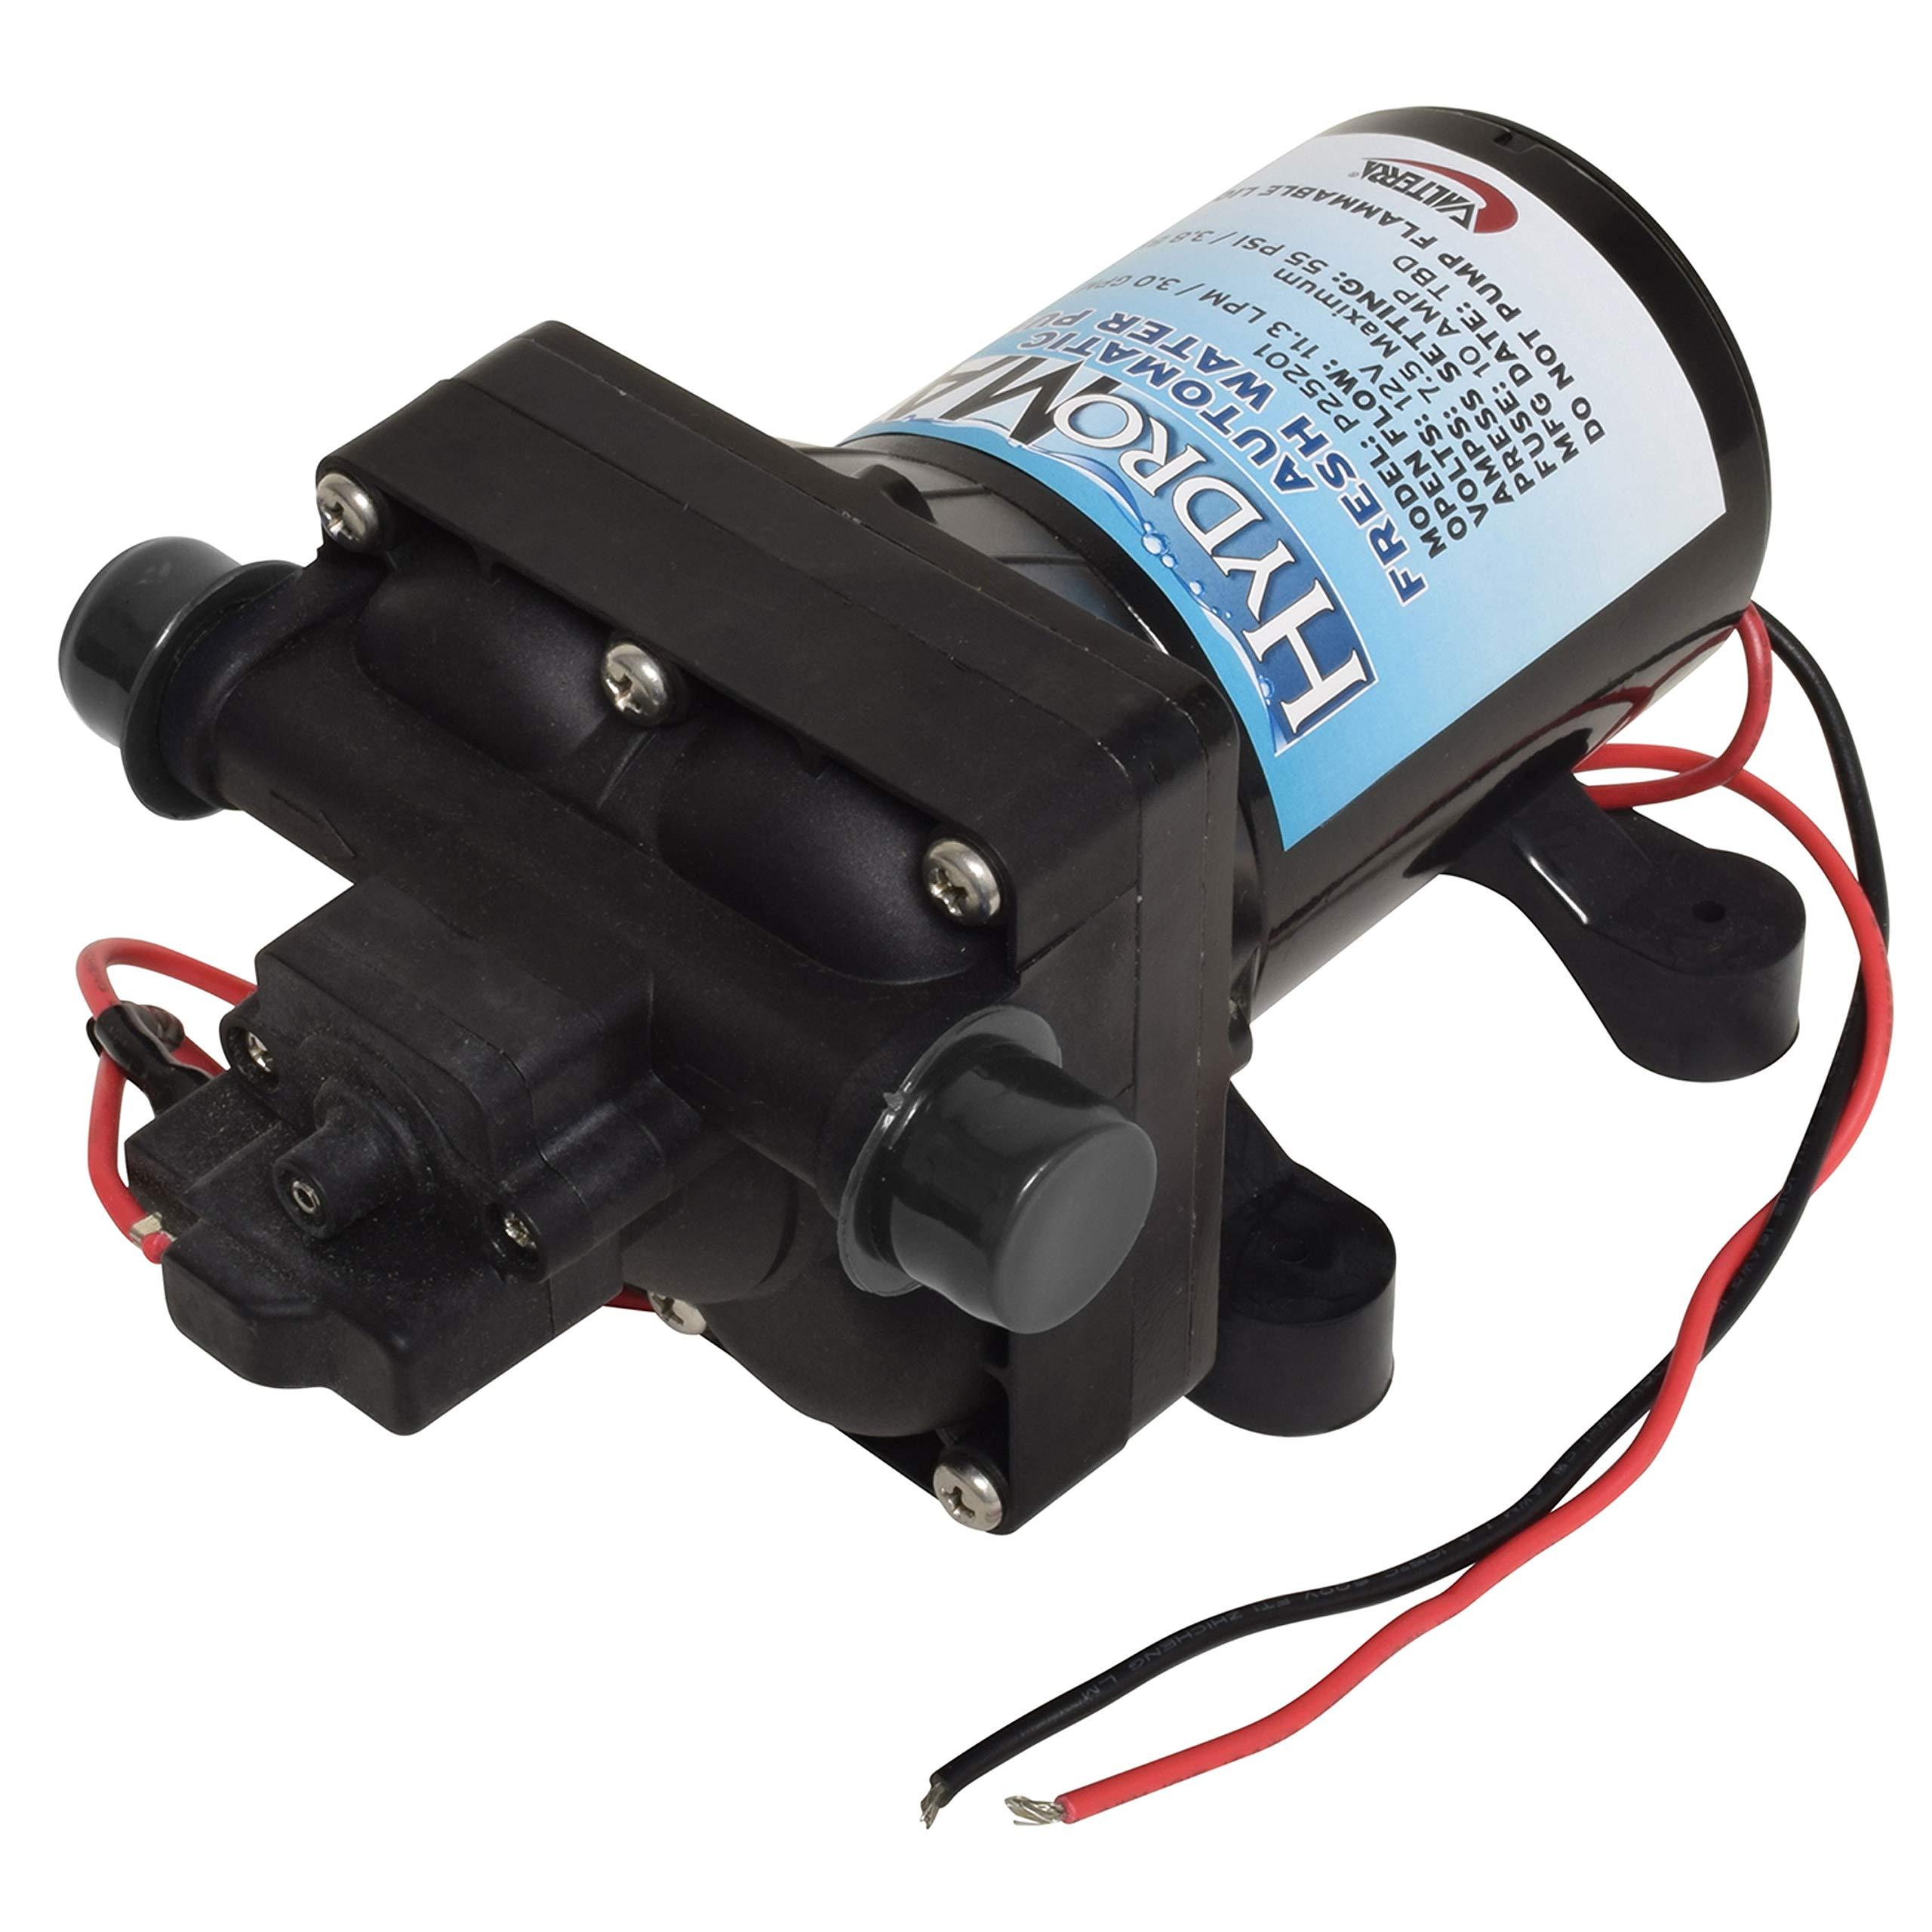 Valterra LLC P25201 Hydromax Automatic RV Freshwater Pump - 3.0 GPM by Valterra